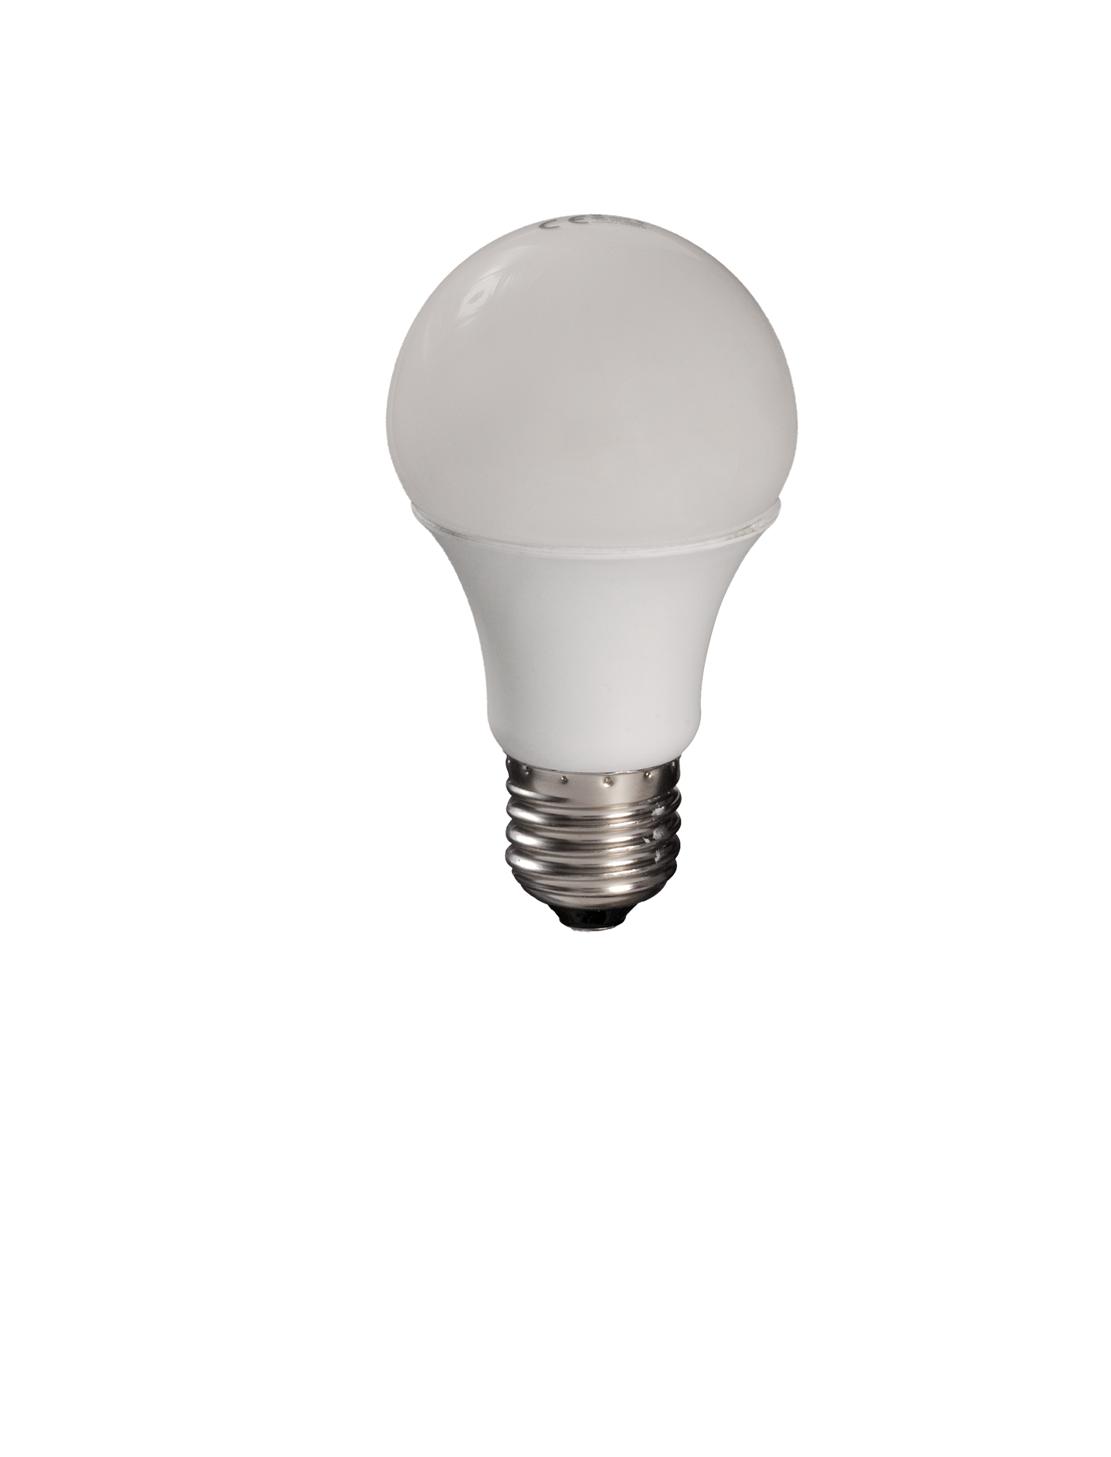 Bombilla Standard LED dimmable en detalle